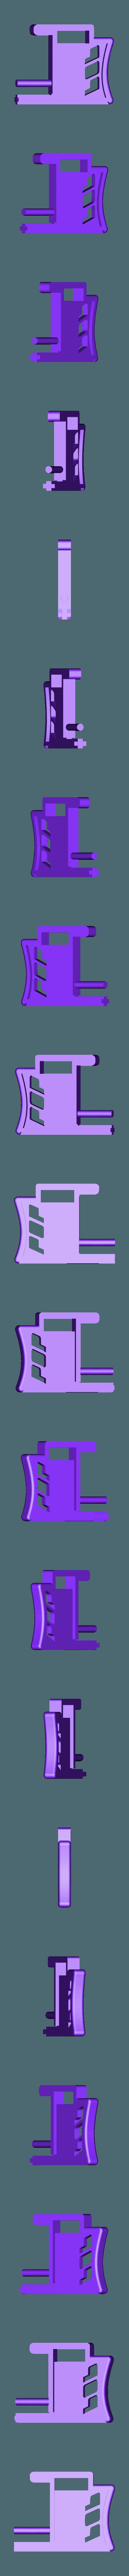 LnL trigger.stl Download free STL file Nerf Lock n' Load Trigger • 3D printable template, popatachi